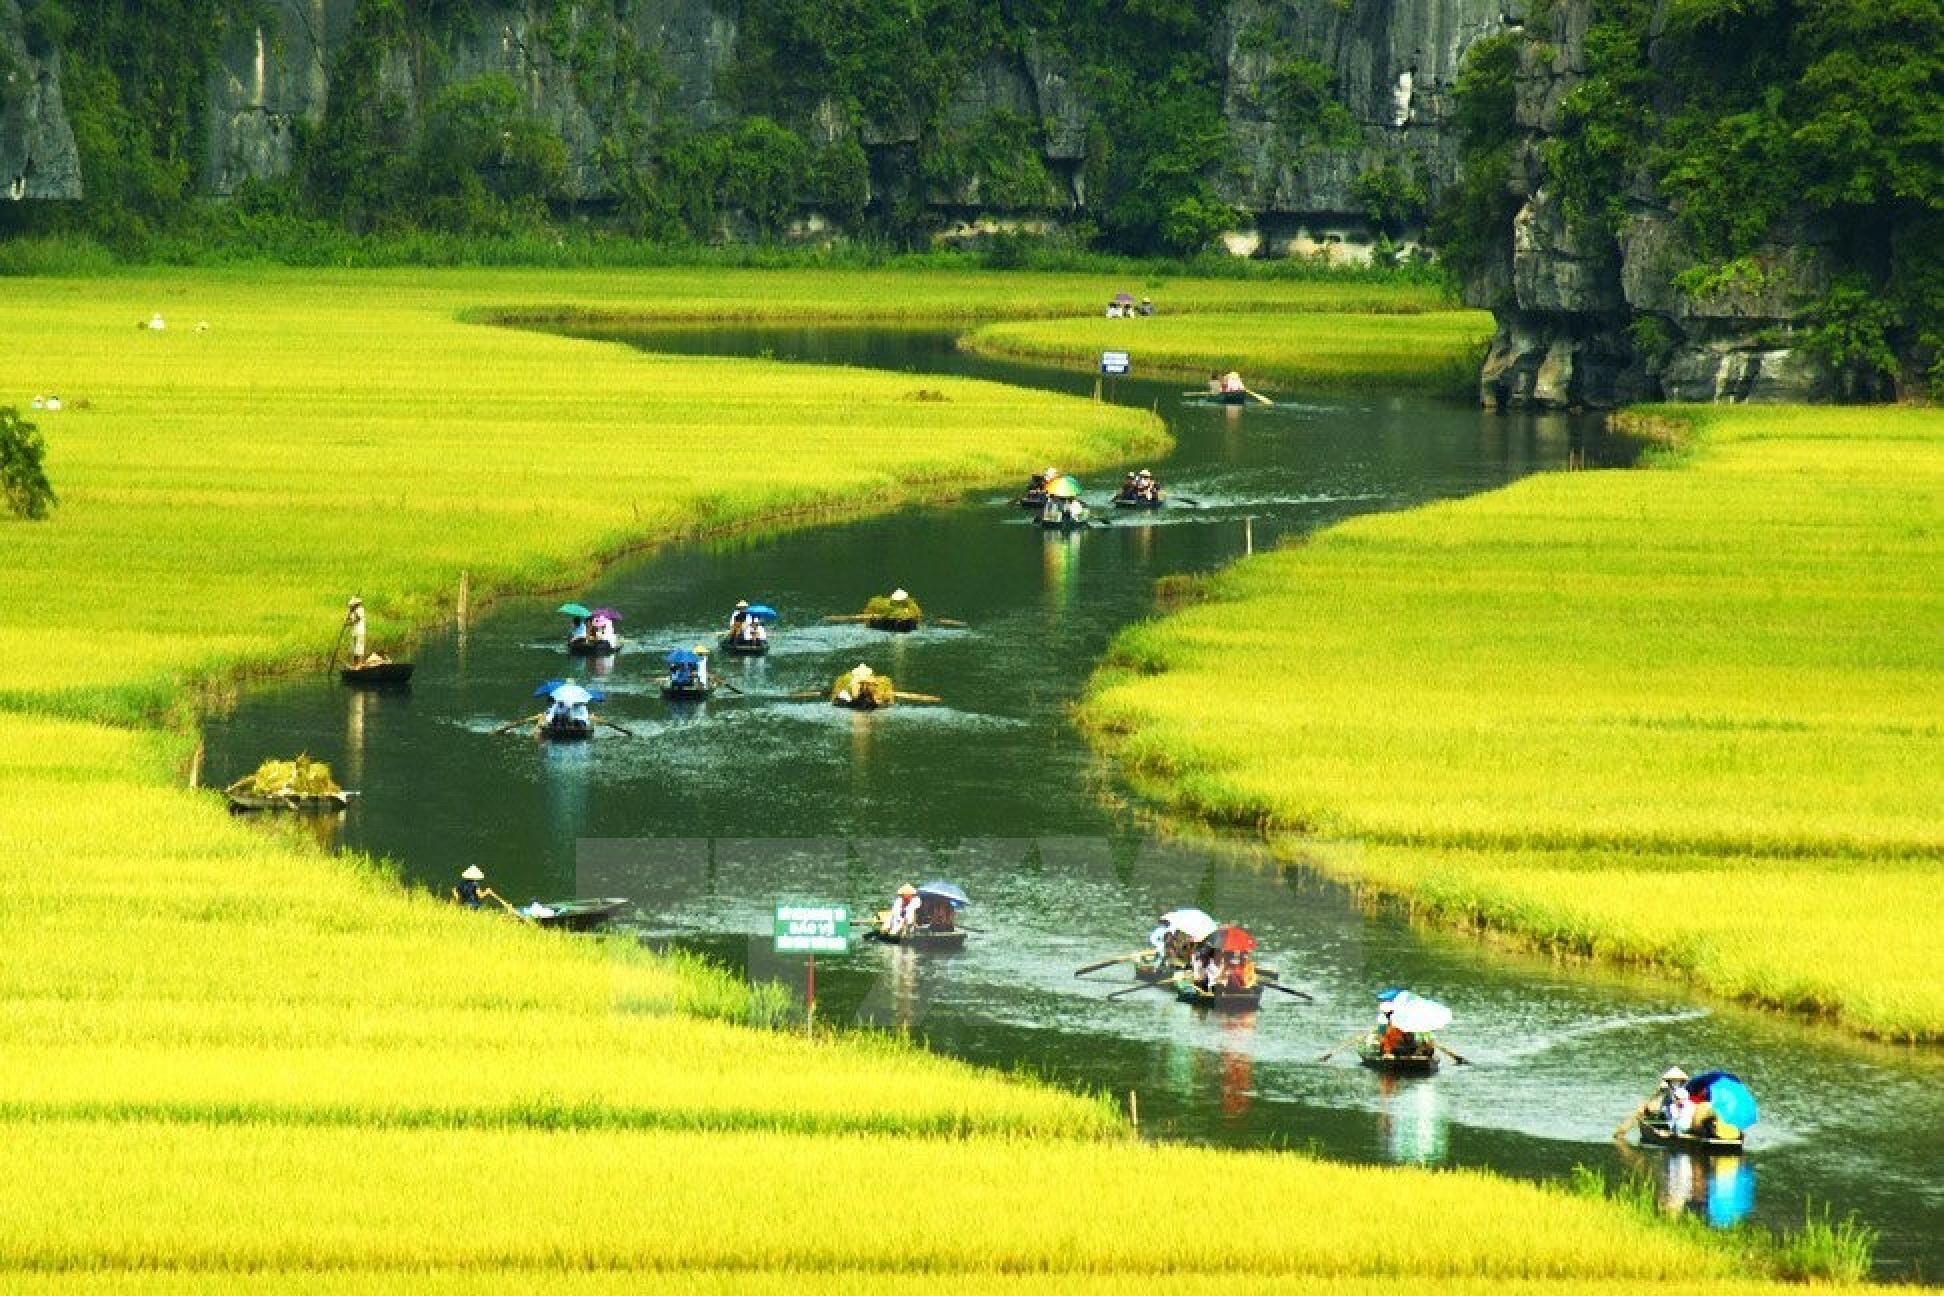 Hanoi to Trang An Day Tour with Bai Dinh Pagoda